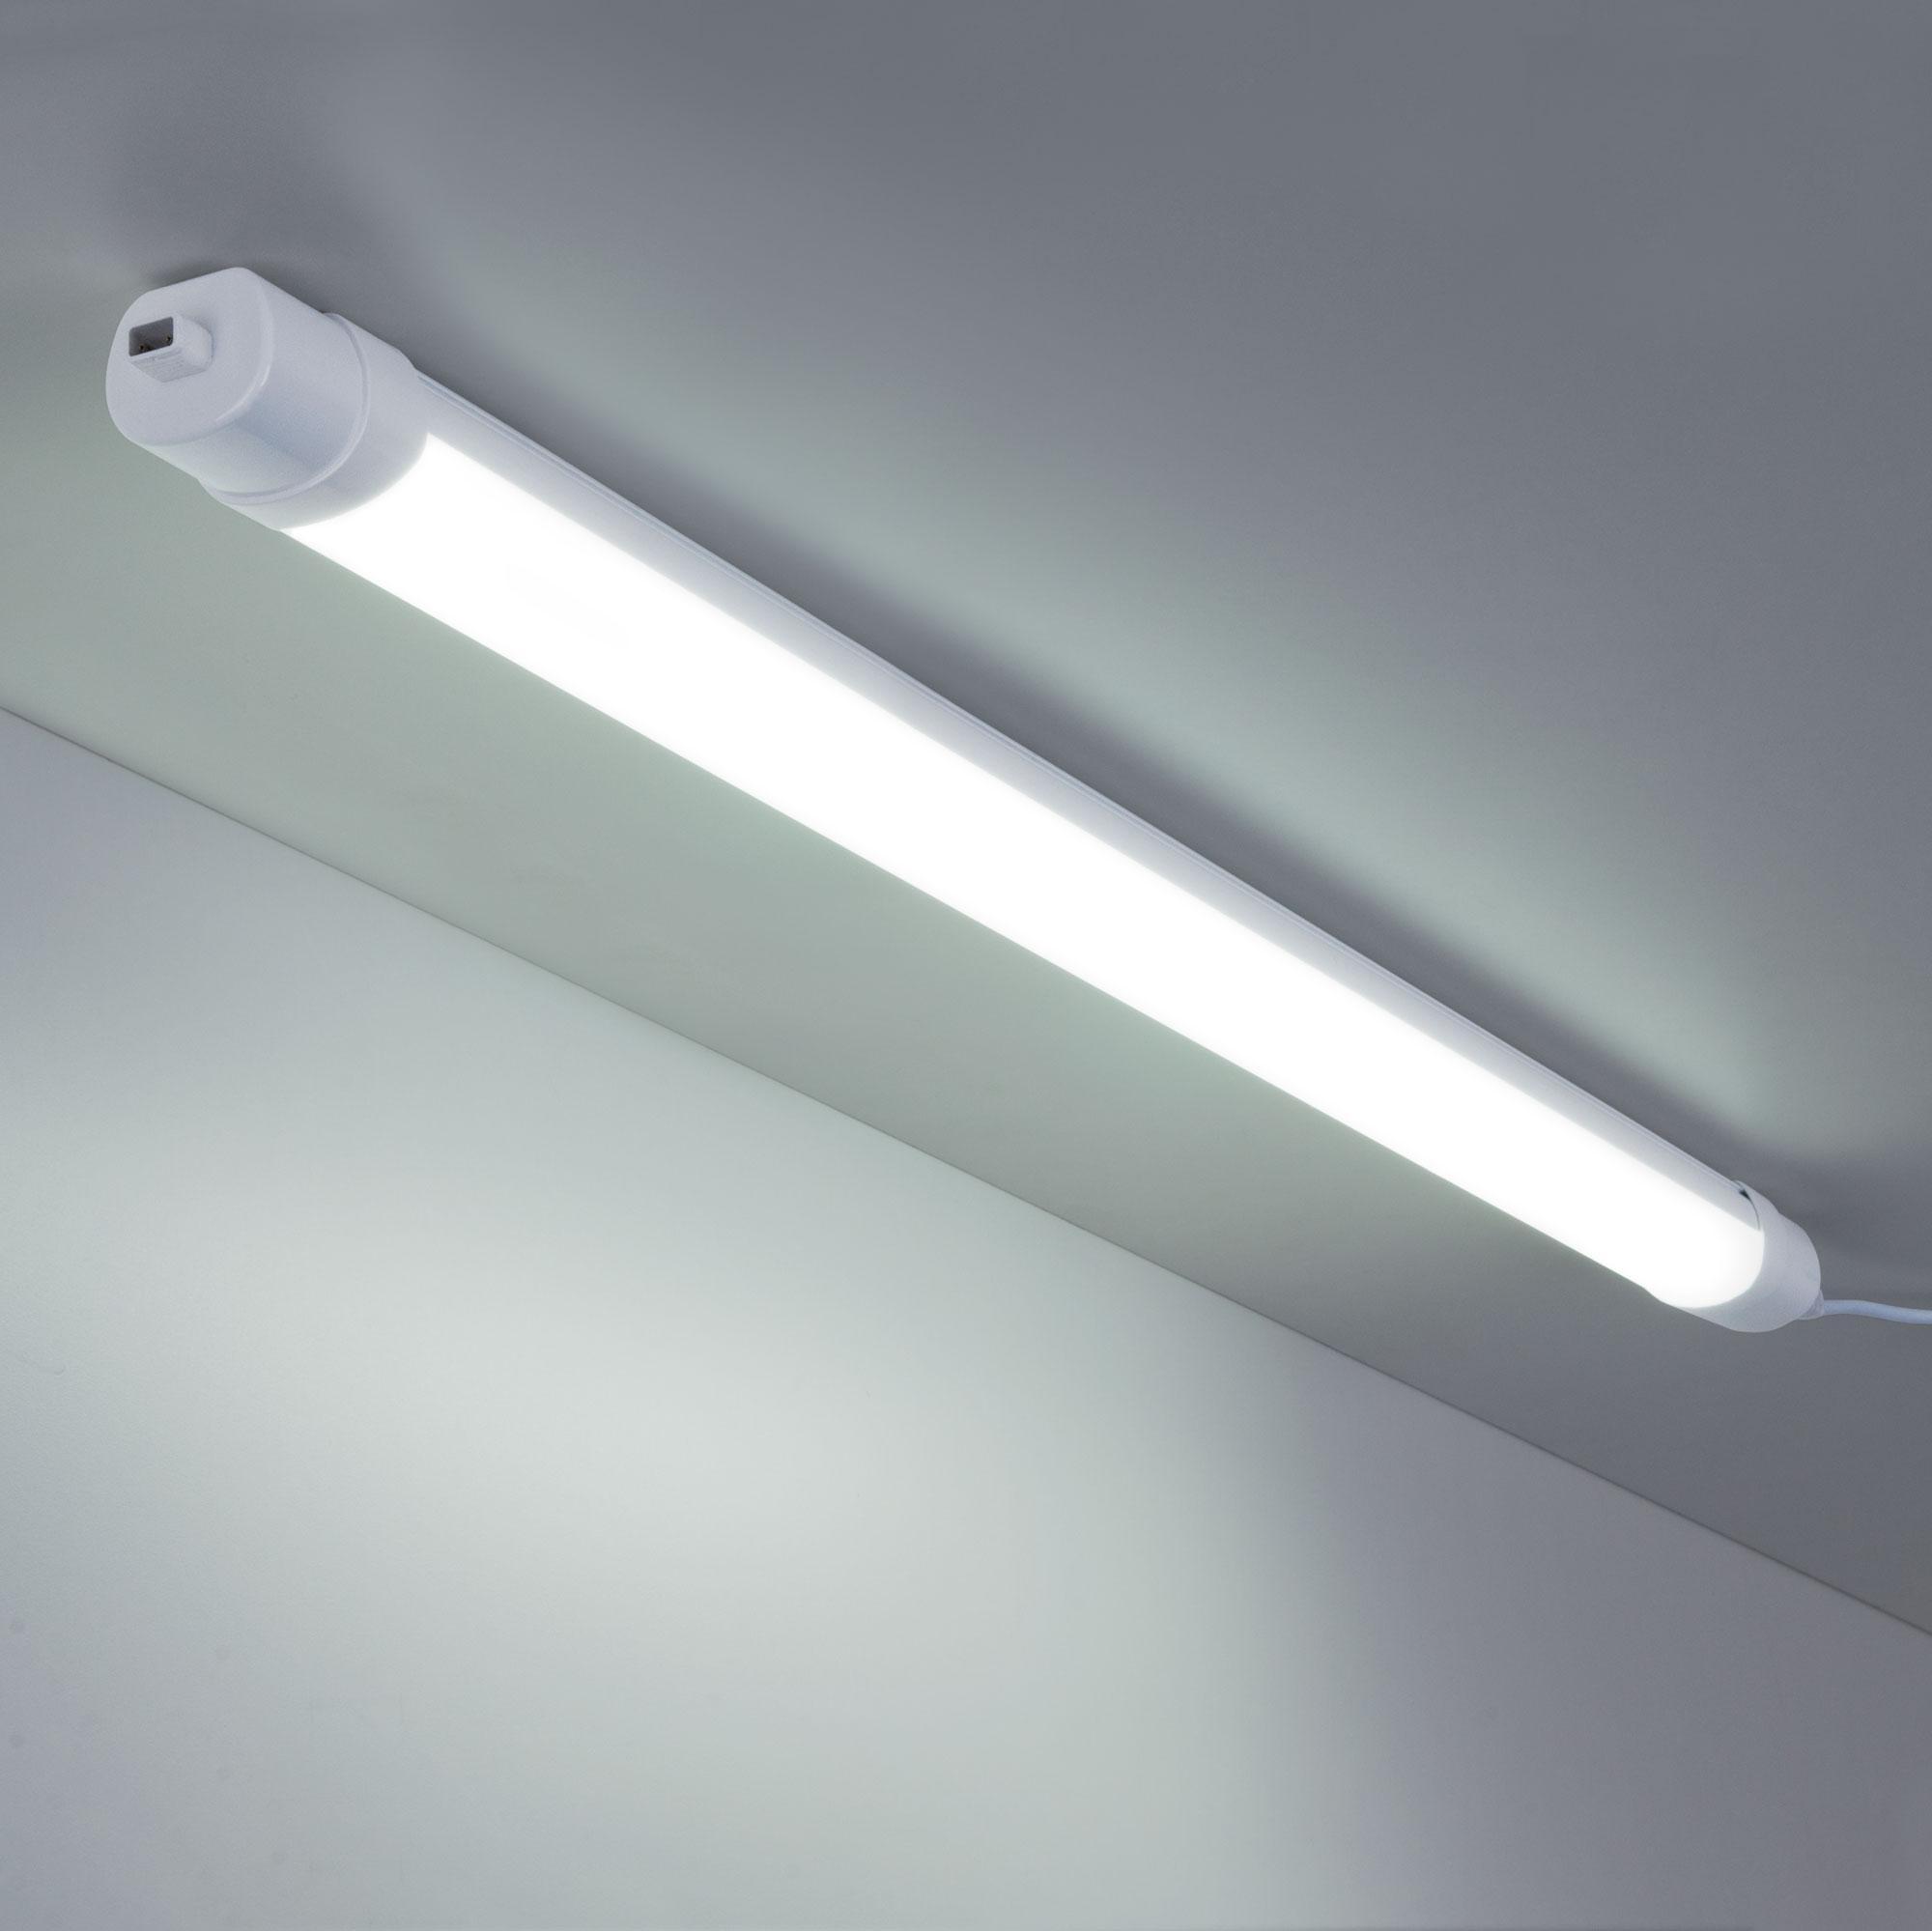 LED Светильник 120 см 36Вт